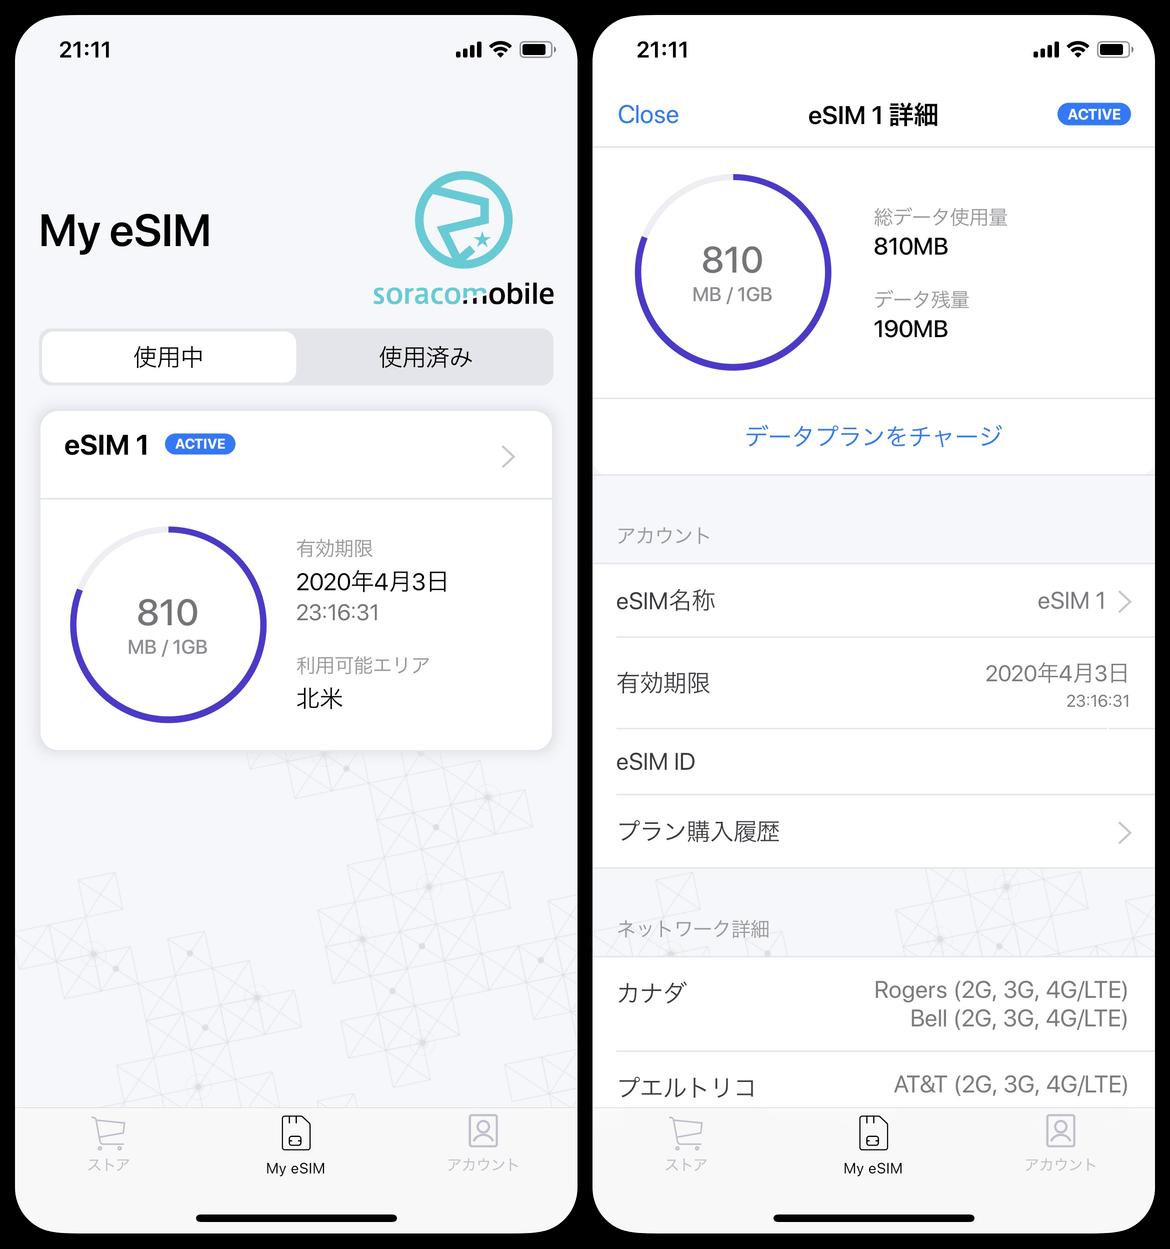 Soracom Mobile My eSIM on App